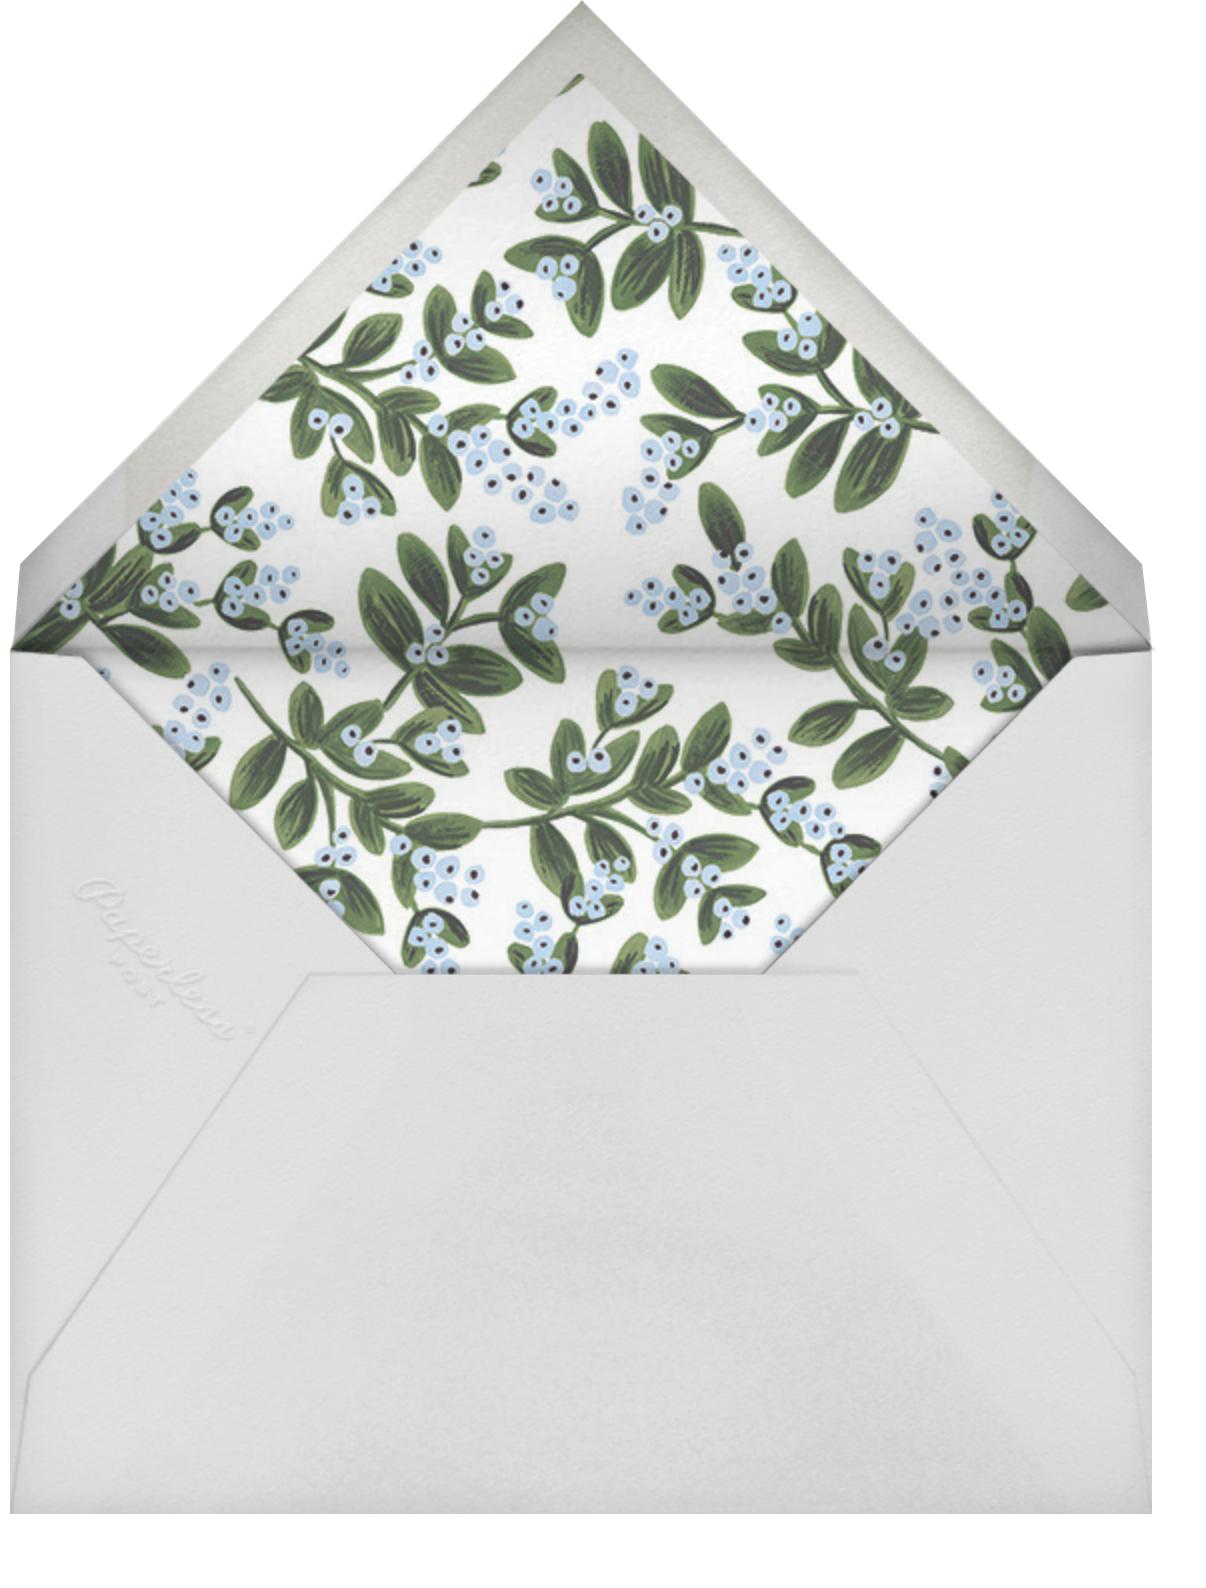 Mistletoe Accent Flourish - Flame - Rifle Paper Co. - Winter entertaining - envelope back